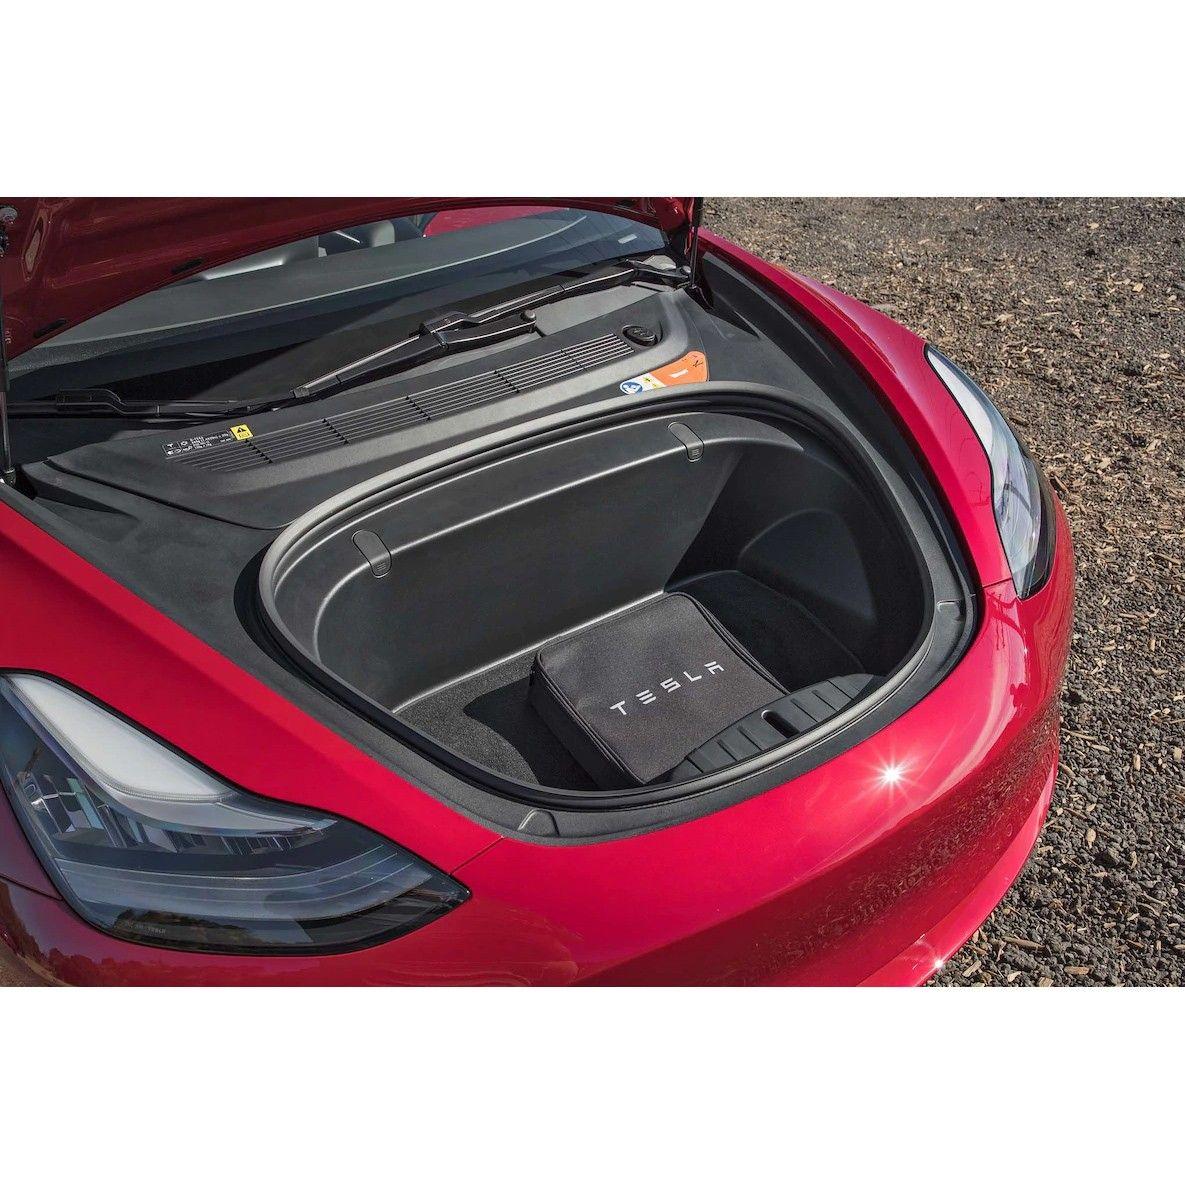 Frunk lifters Tesla Model 3 - Automatisk heving av panser